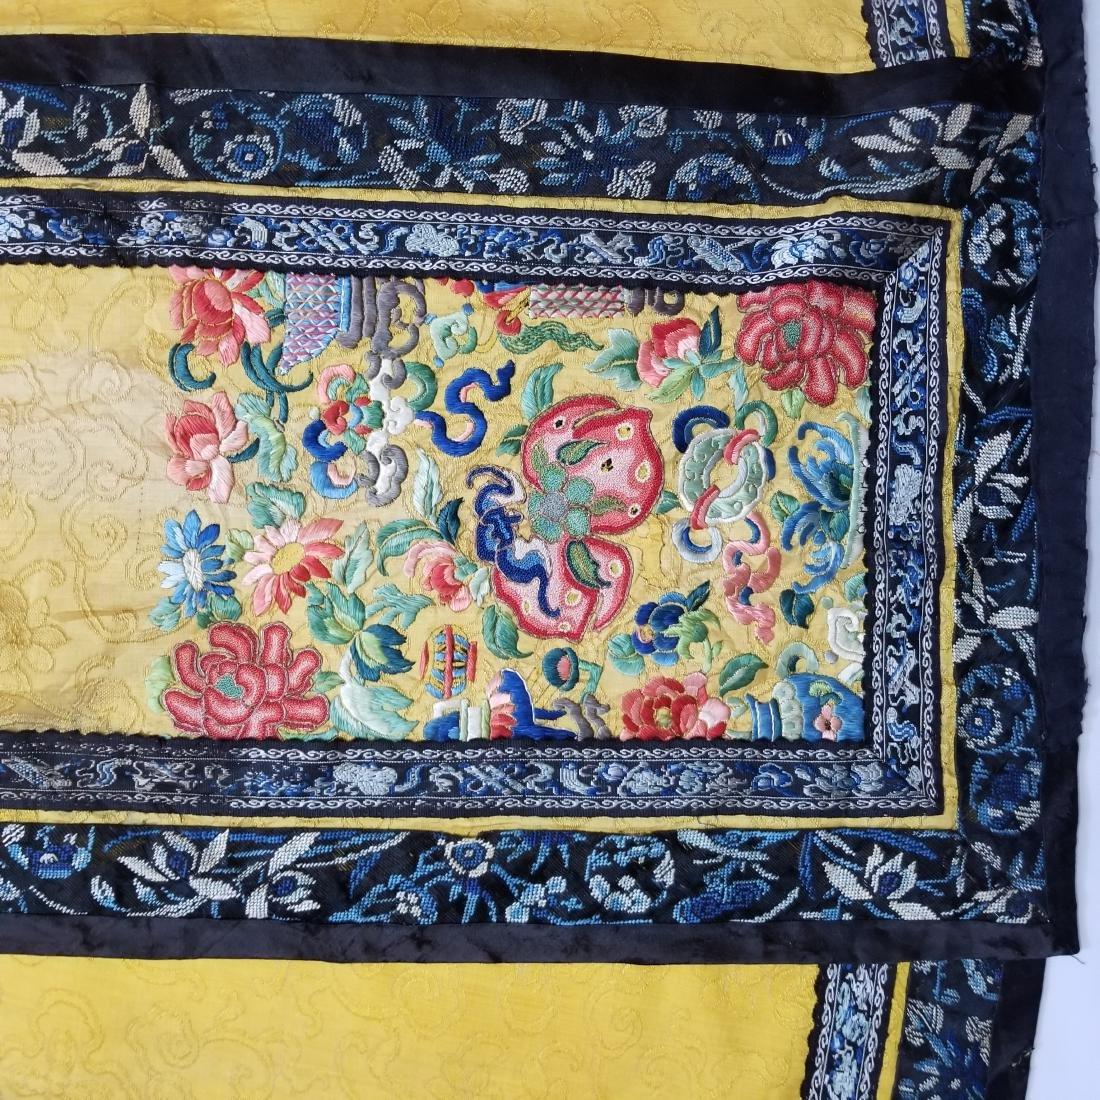 Antique Chinese Silk Hand Embroidered Skirt Forbidden - 4